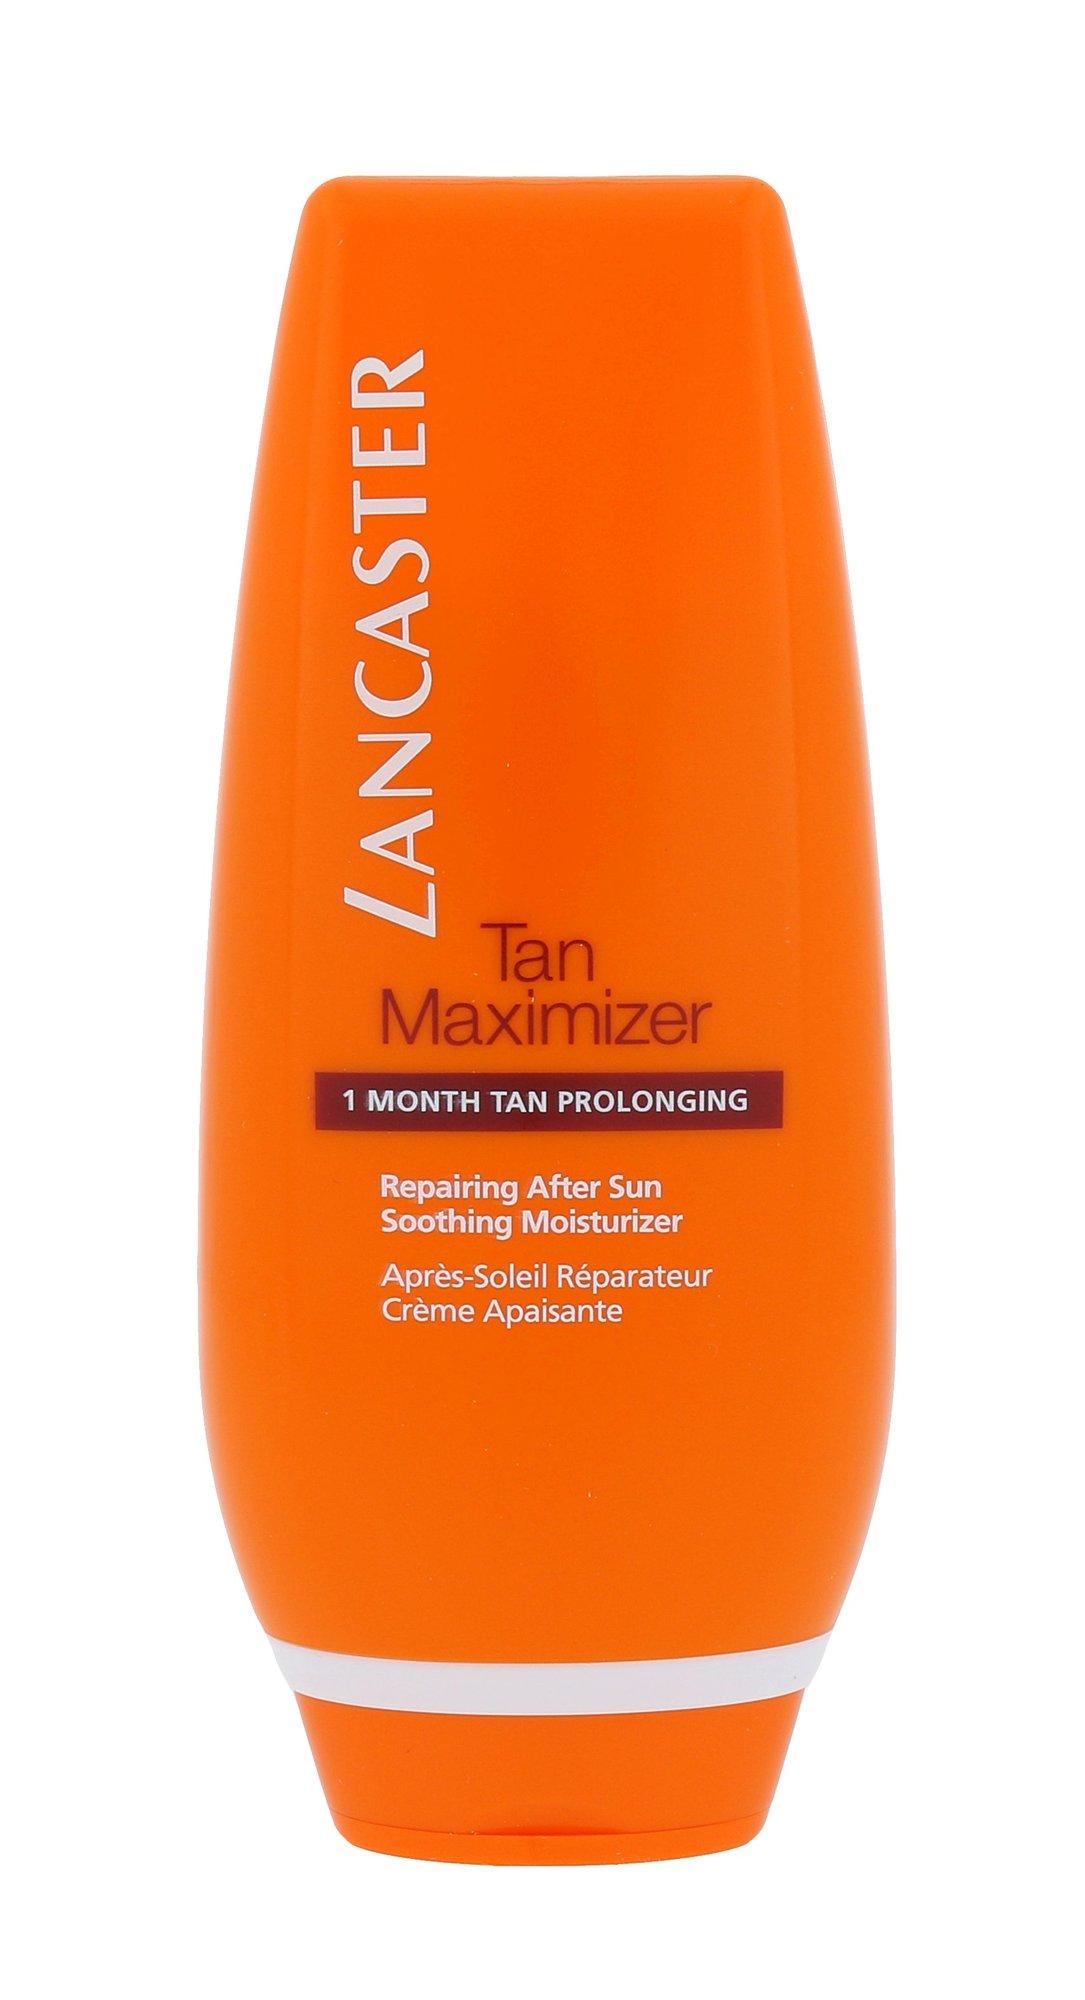 Lancaster Tan Maximizer Repairing After Sun Moisturizer Cosmetic 125ml